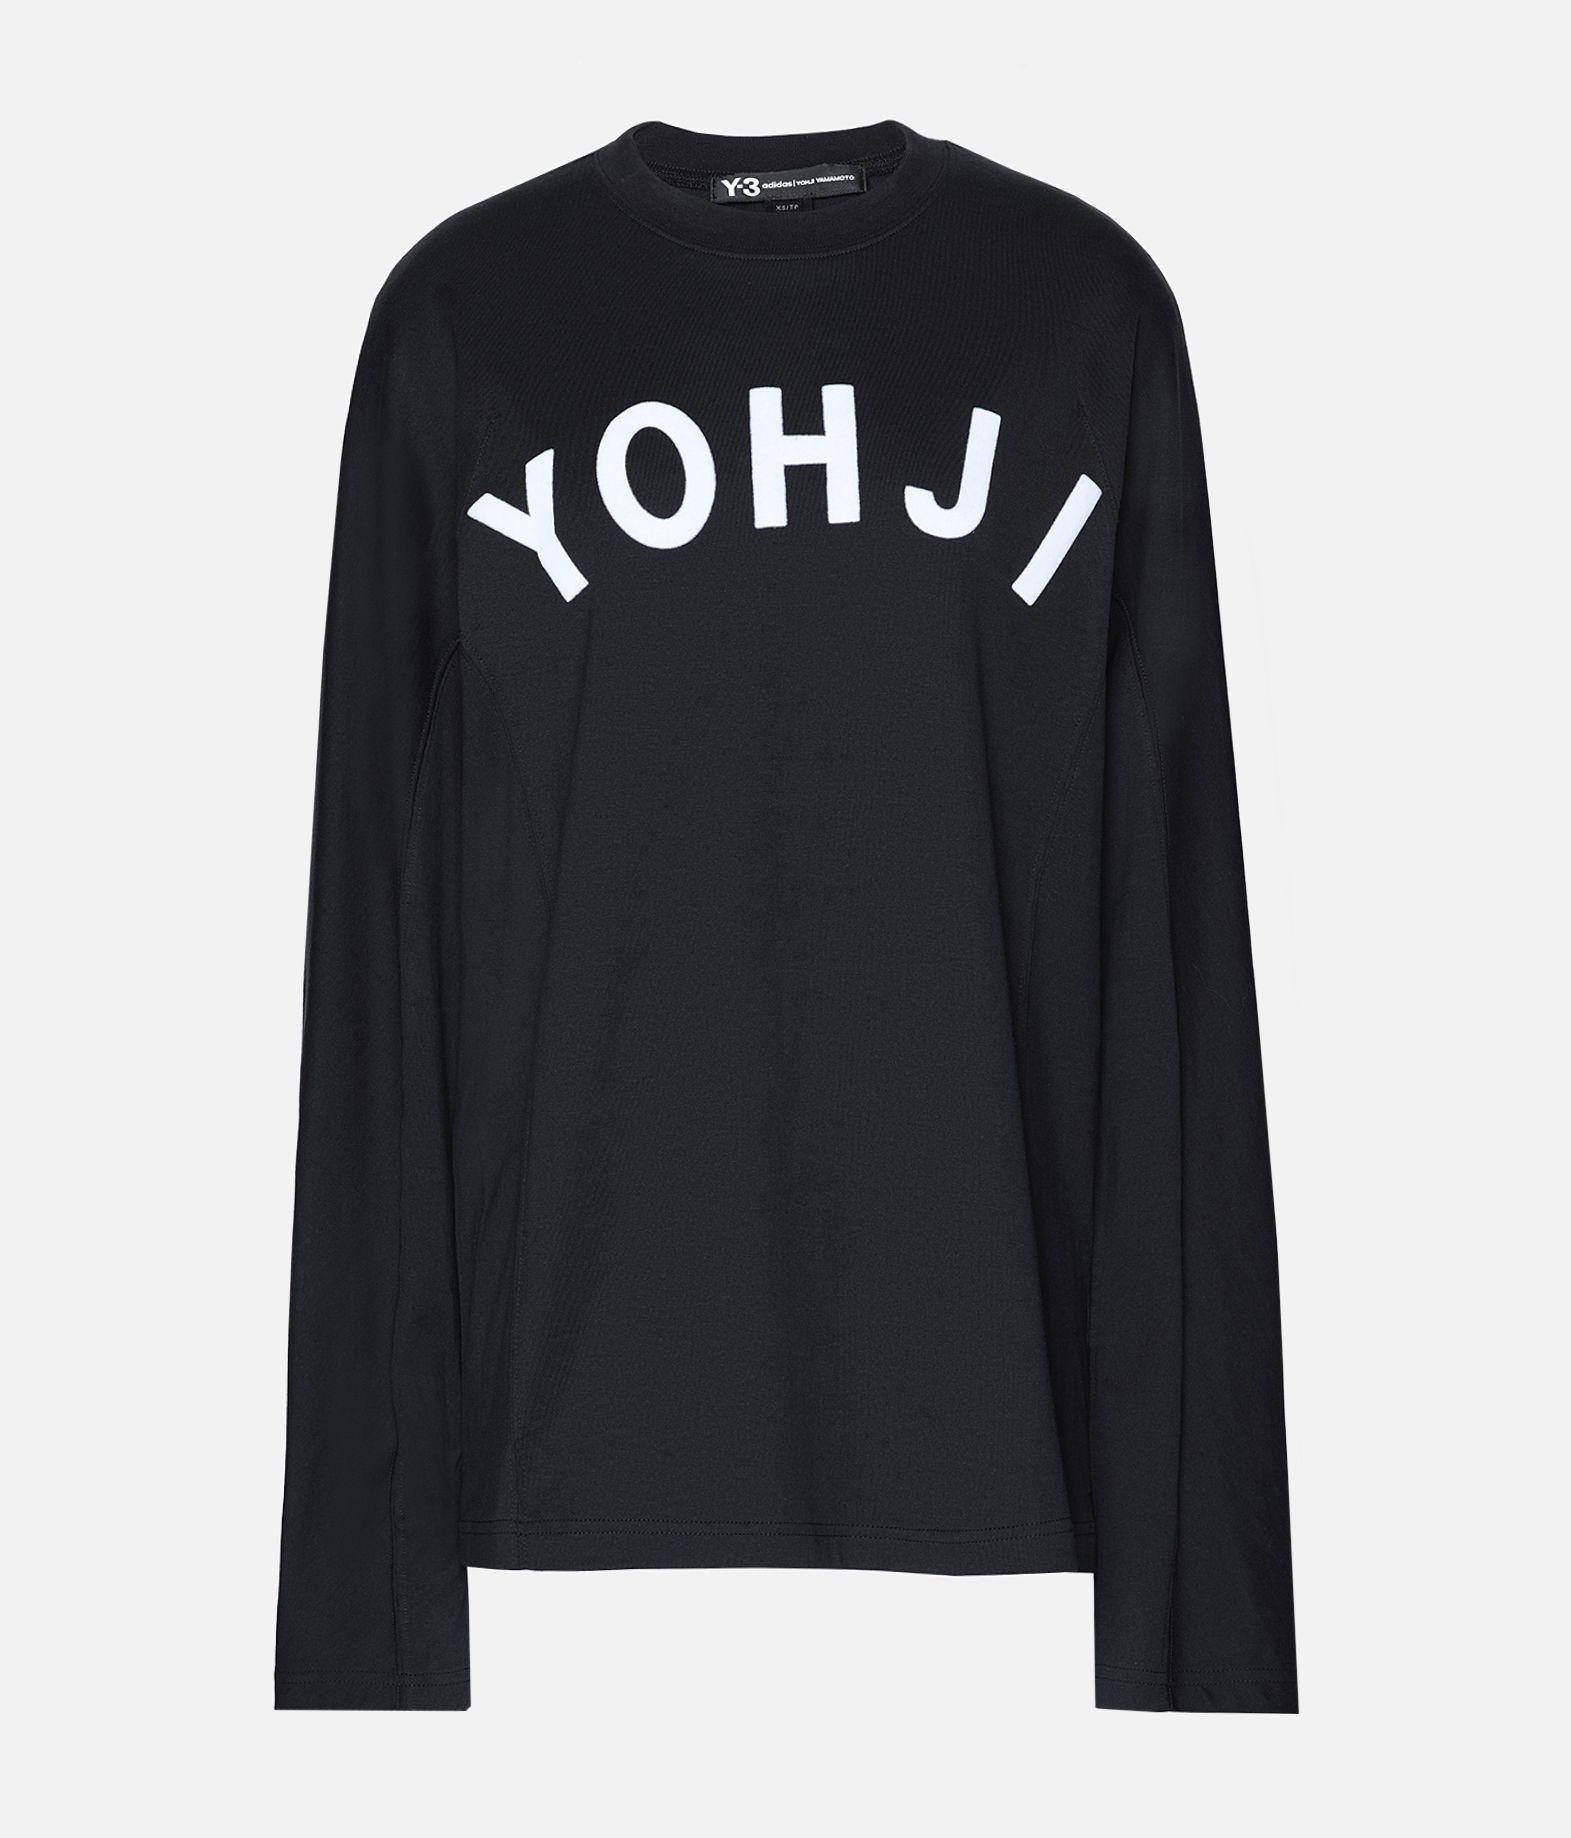 576f9da1430bd2 ... Y-3 Y-3 Yohji Letters Tee Long sleeve t-shirt Woman f ...